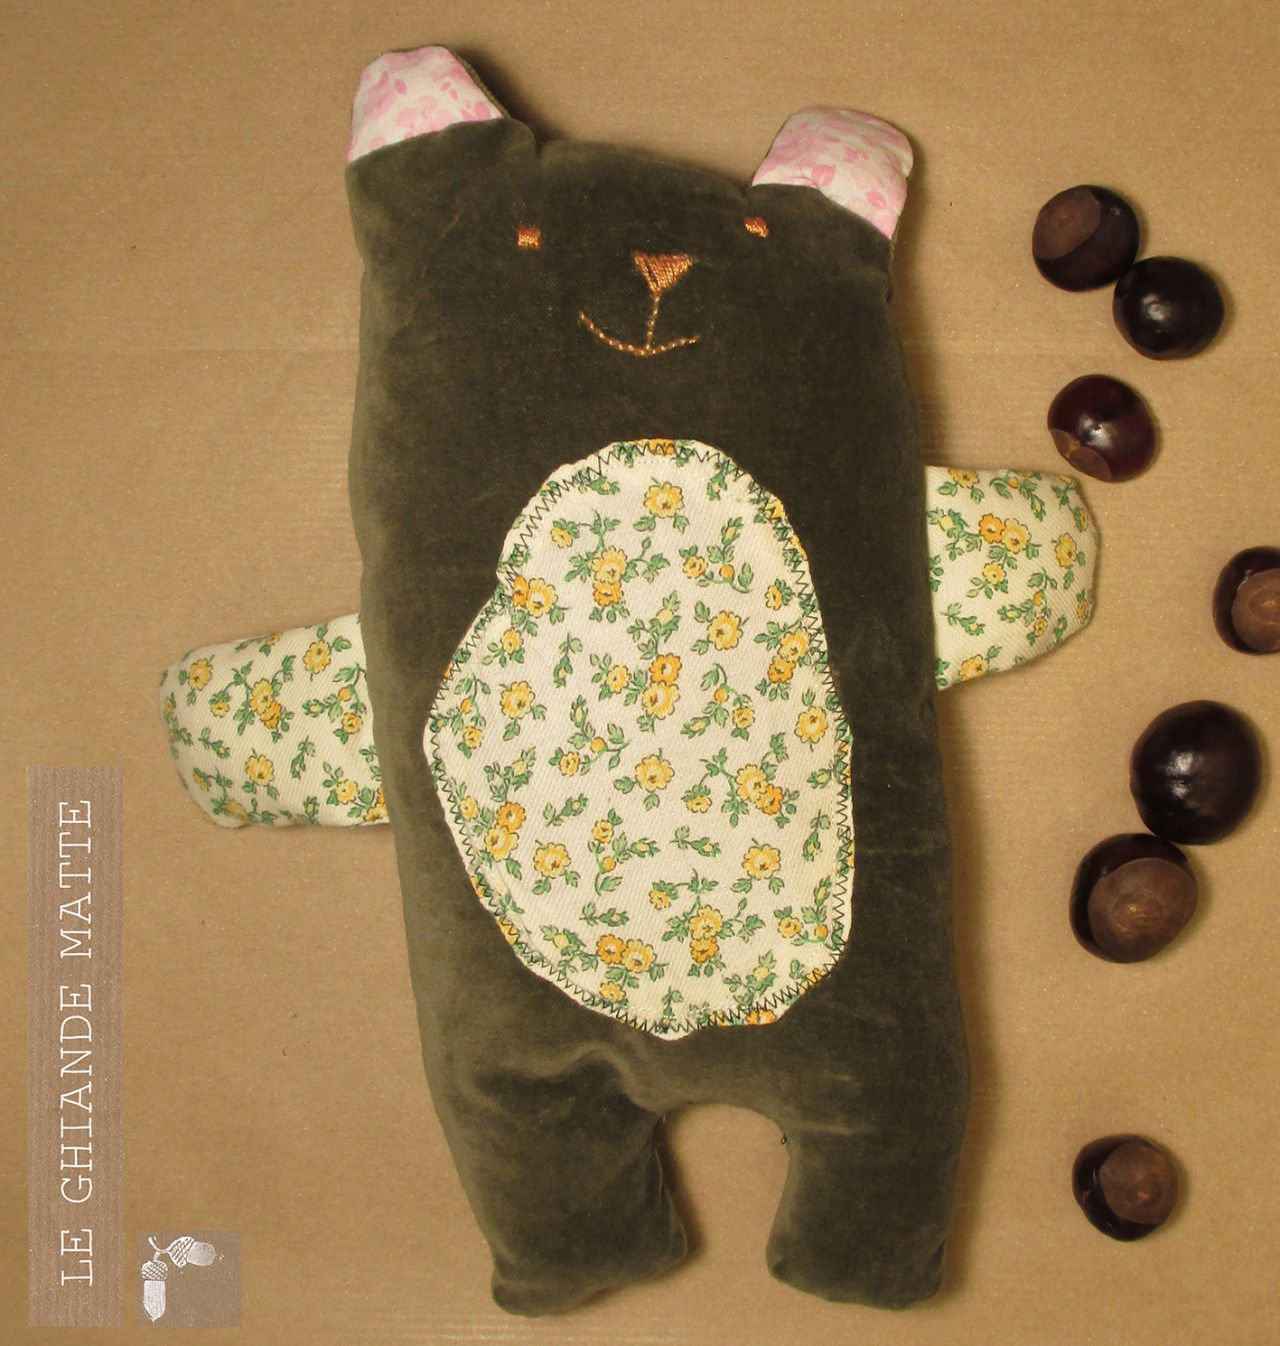 Le ghiande matte, orsetto handmade tenero in velluto e tessuto a fiori! <3  vanitas #vanitascremona #vanitasmarket www.vanitasonline.com